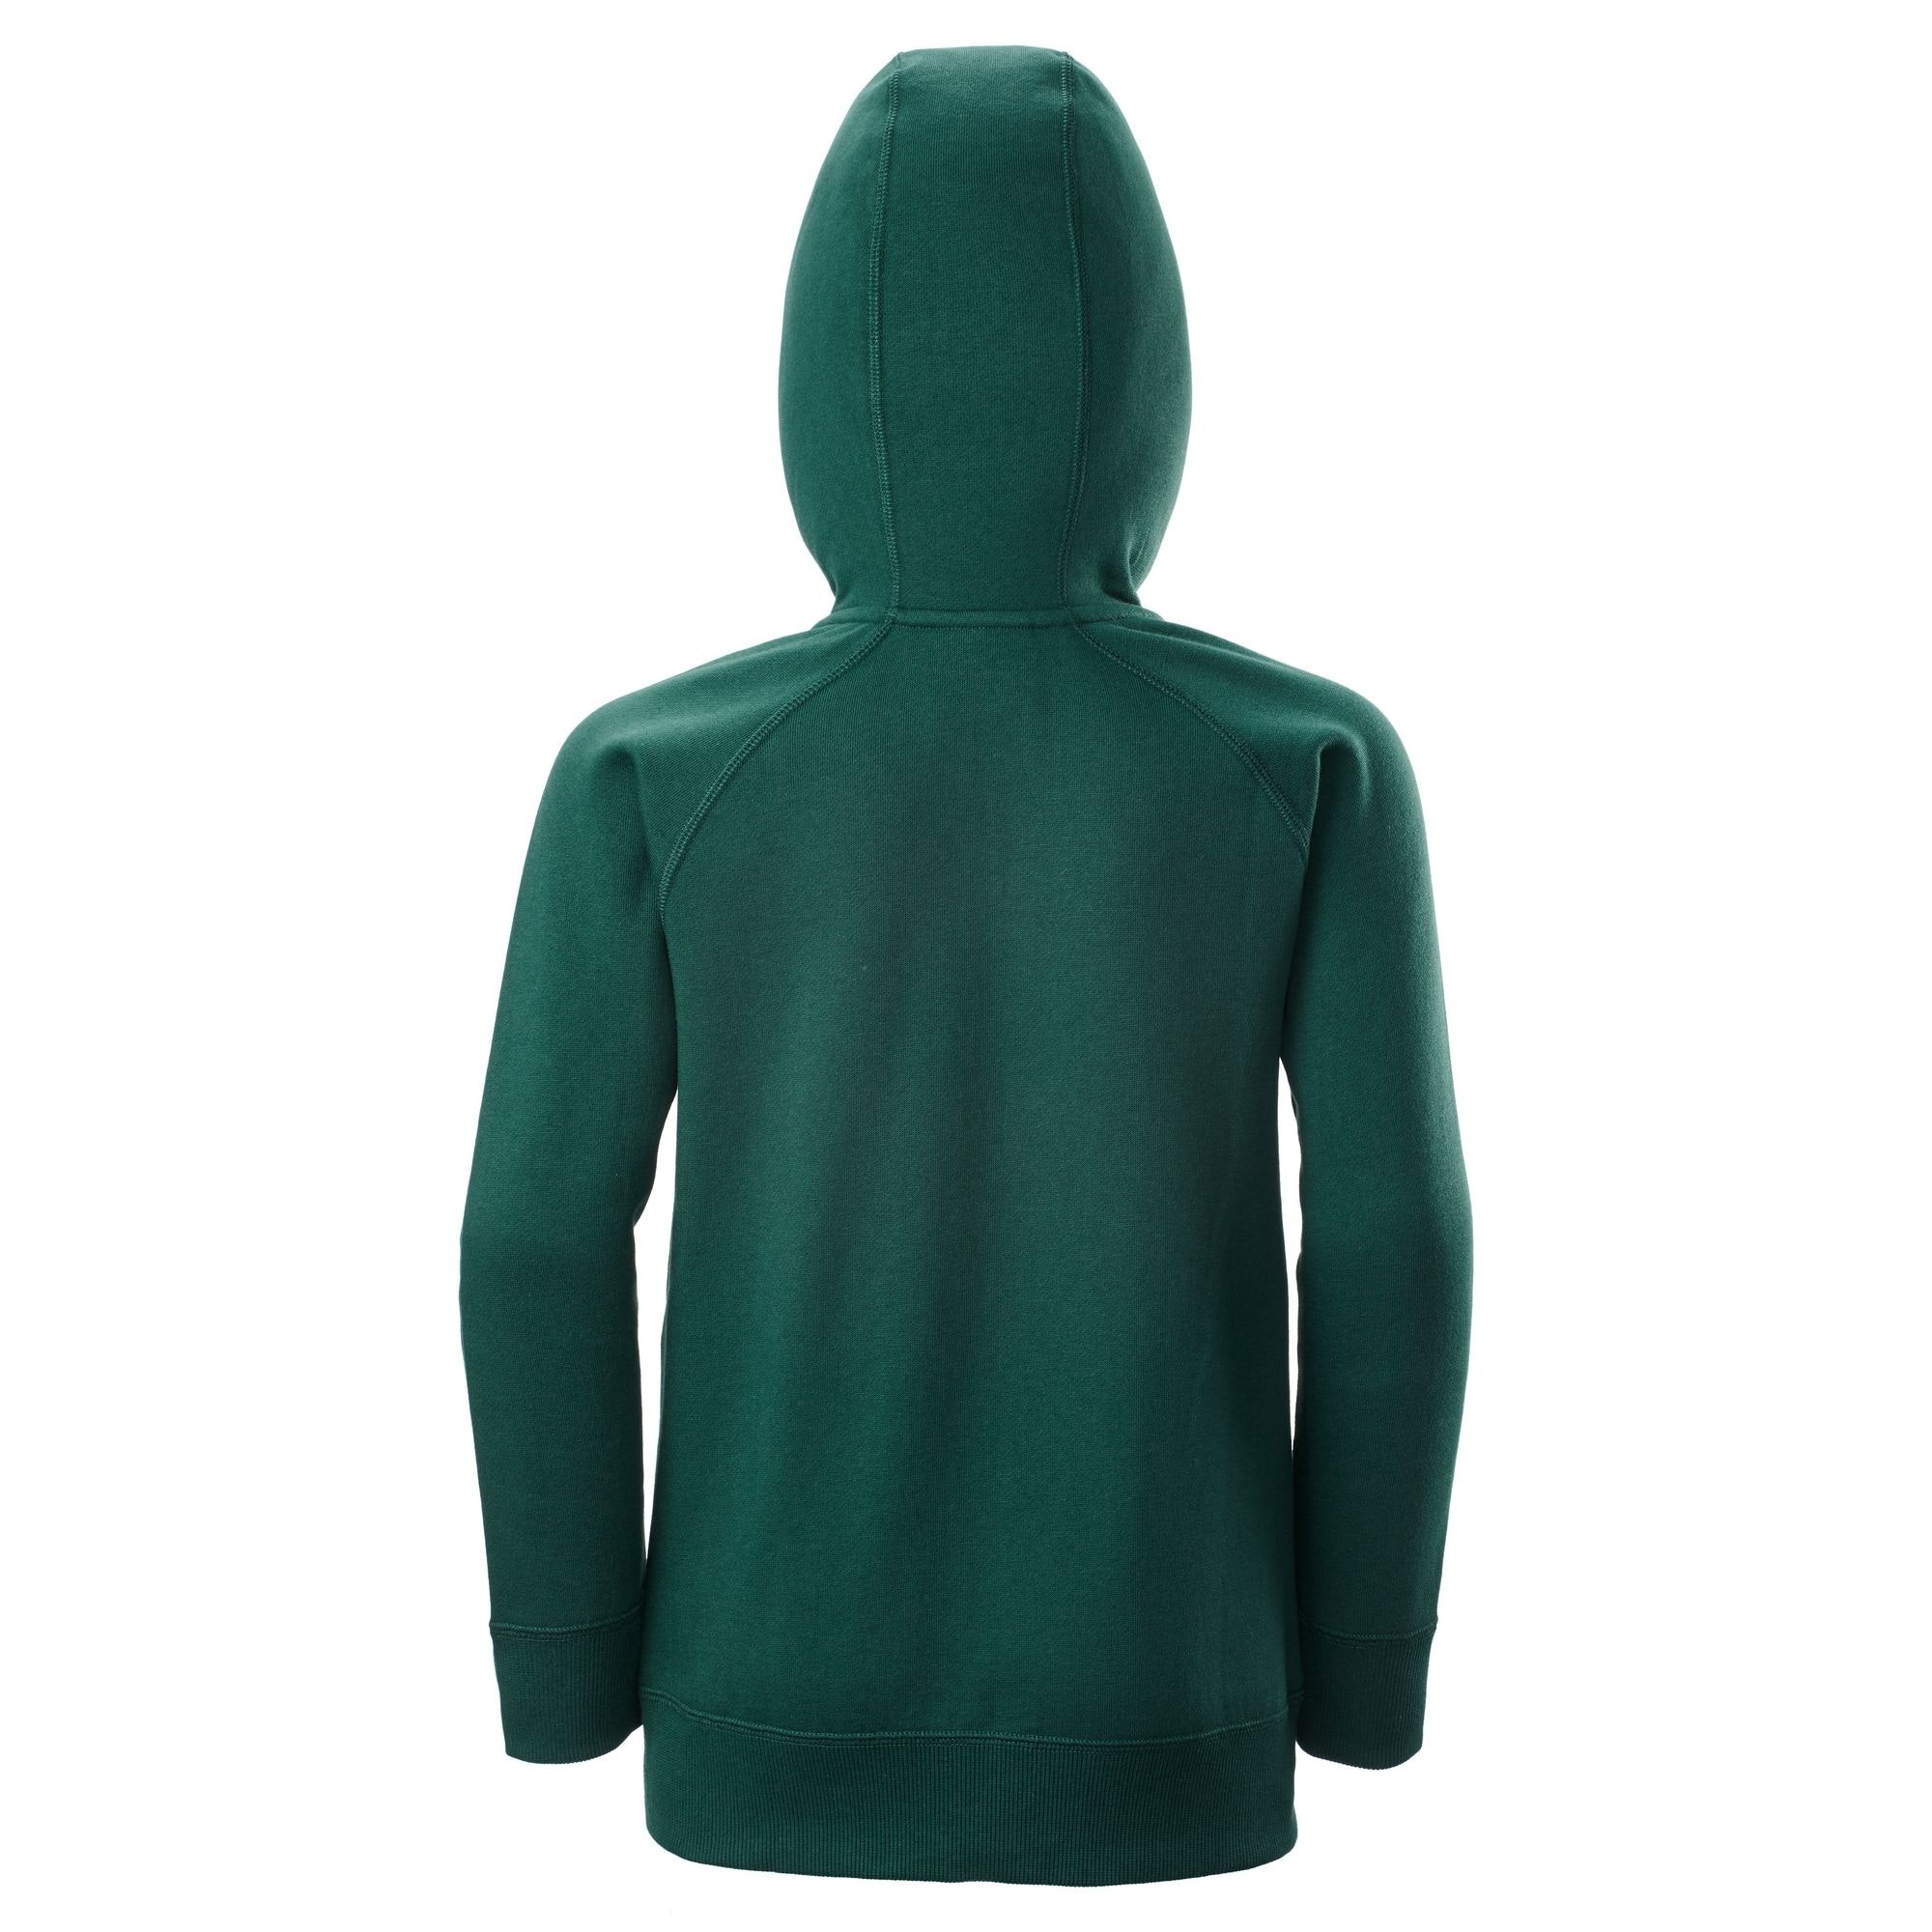 NEW-Kathmandu-Youth-Boy-039-s-Girl-039-s-Full-Zip-Hooded-Winter-Warm-Fleece-Jacket thumbnail 7